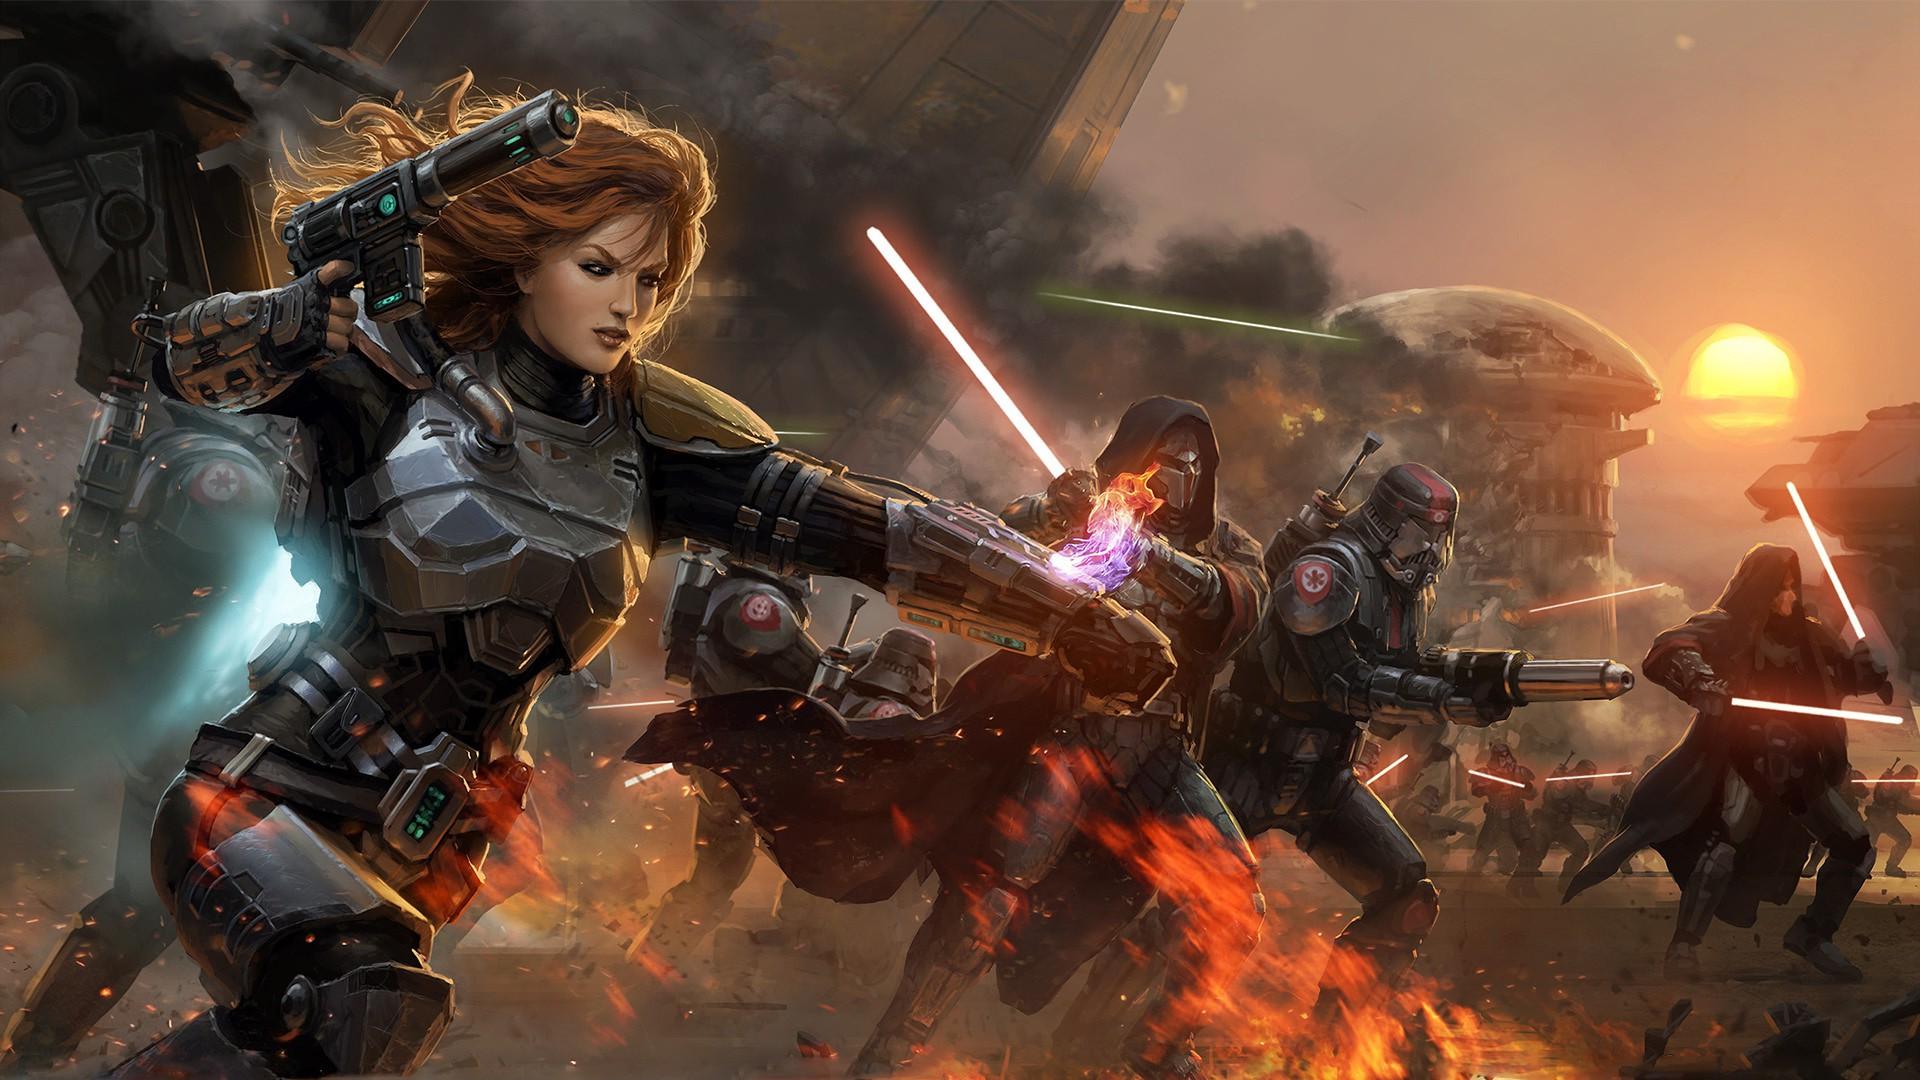 Fondos De Pantalla Guerra De Las Galaxias Guerra